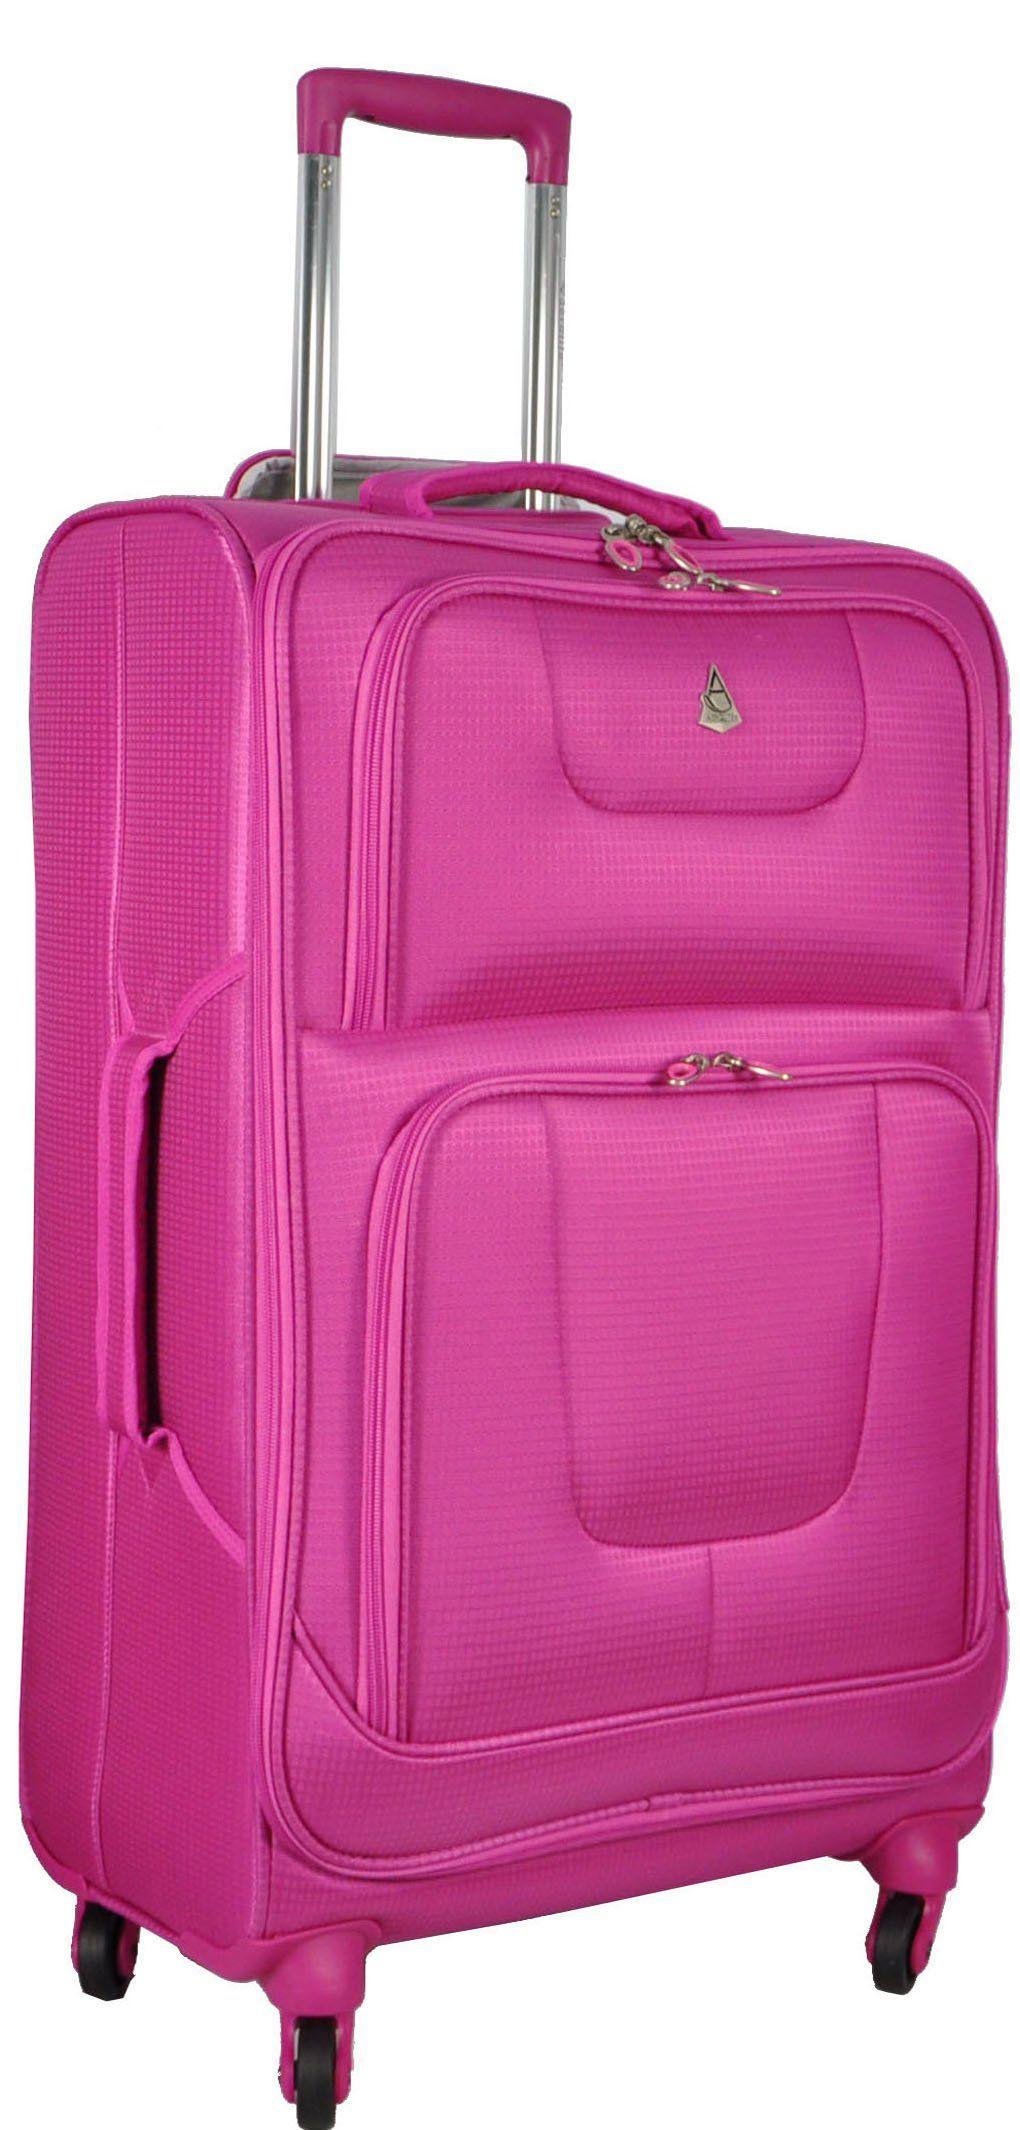 ecb1b649ae8fae Aerolite Super Lightweight World lightest Suitcase Trolley Cases Bag Luggage  (29